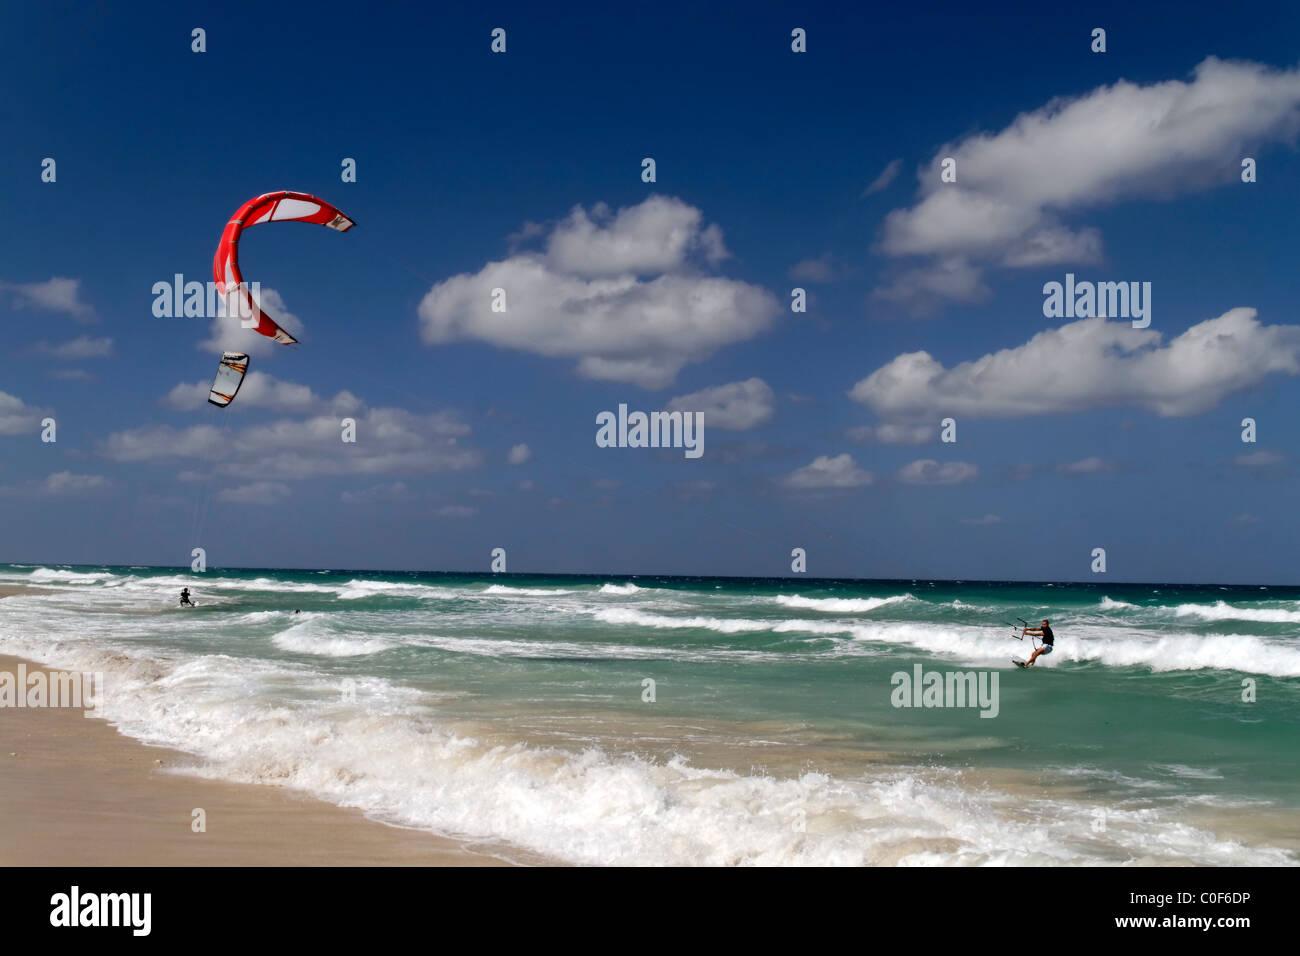 Kitesurfer am Playa del Este in der Nähe von Havanna Kuba Stockbild